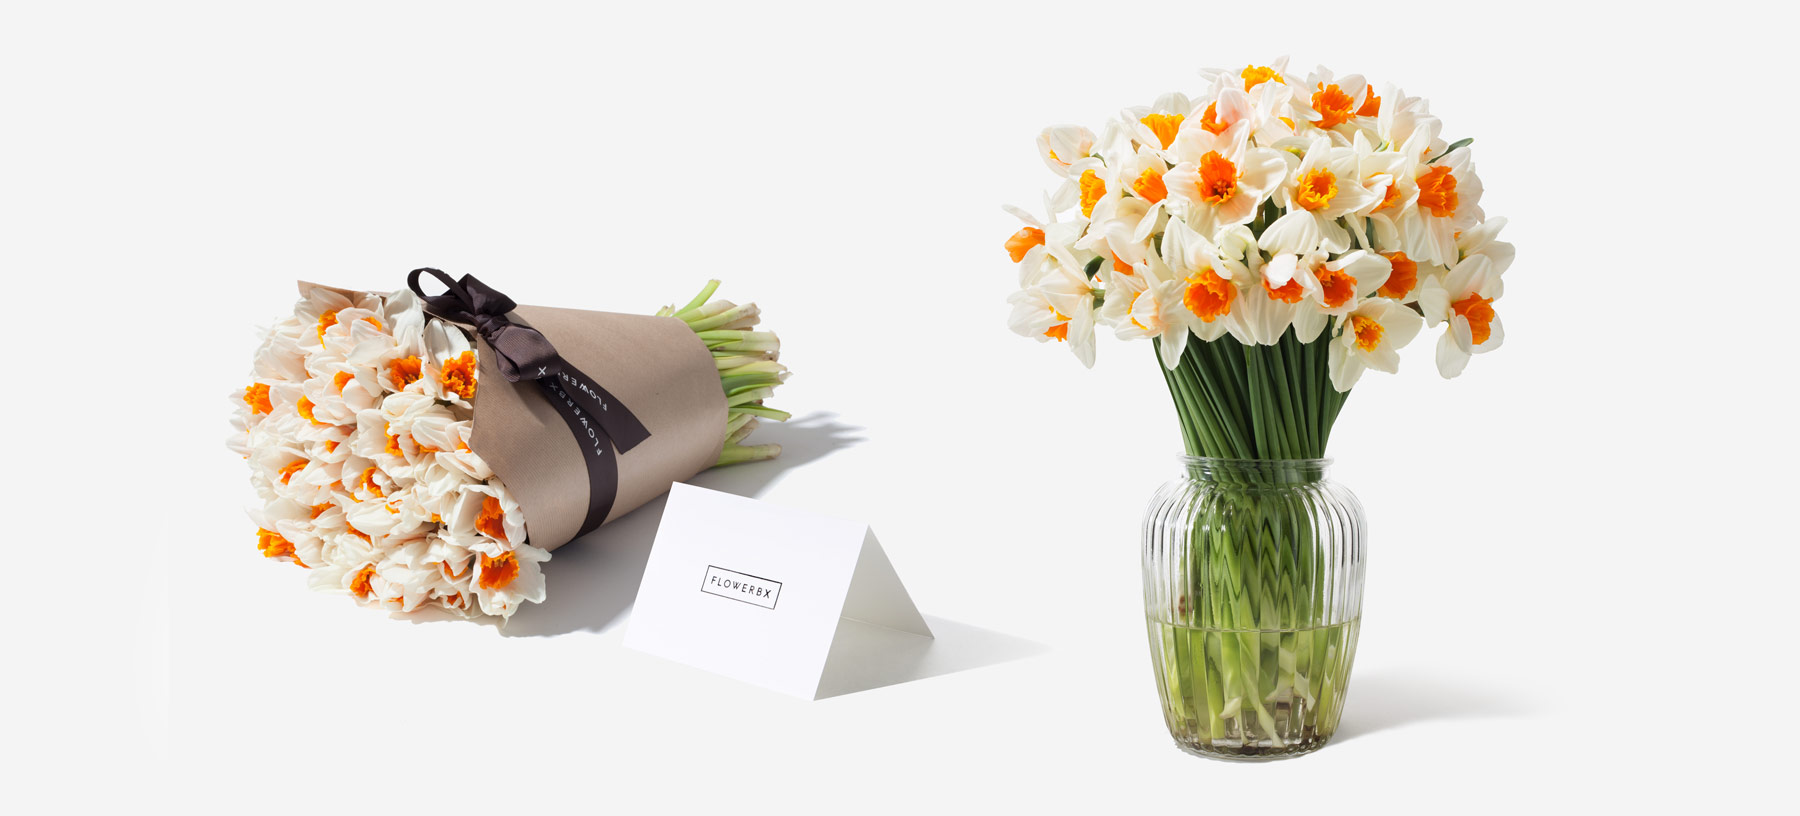 Daffodil Gift and Vase Set